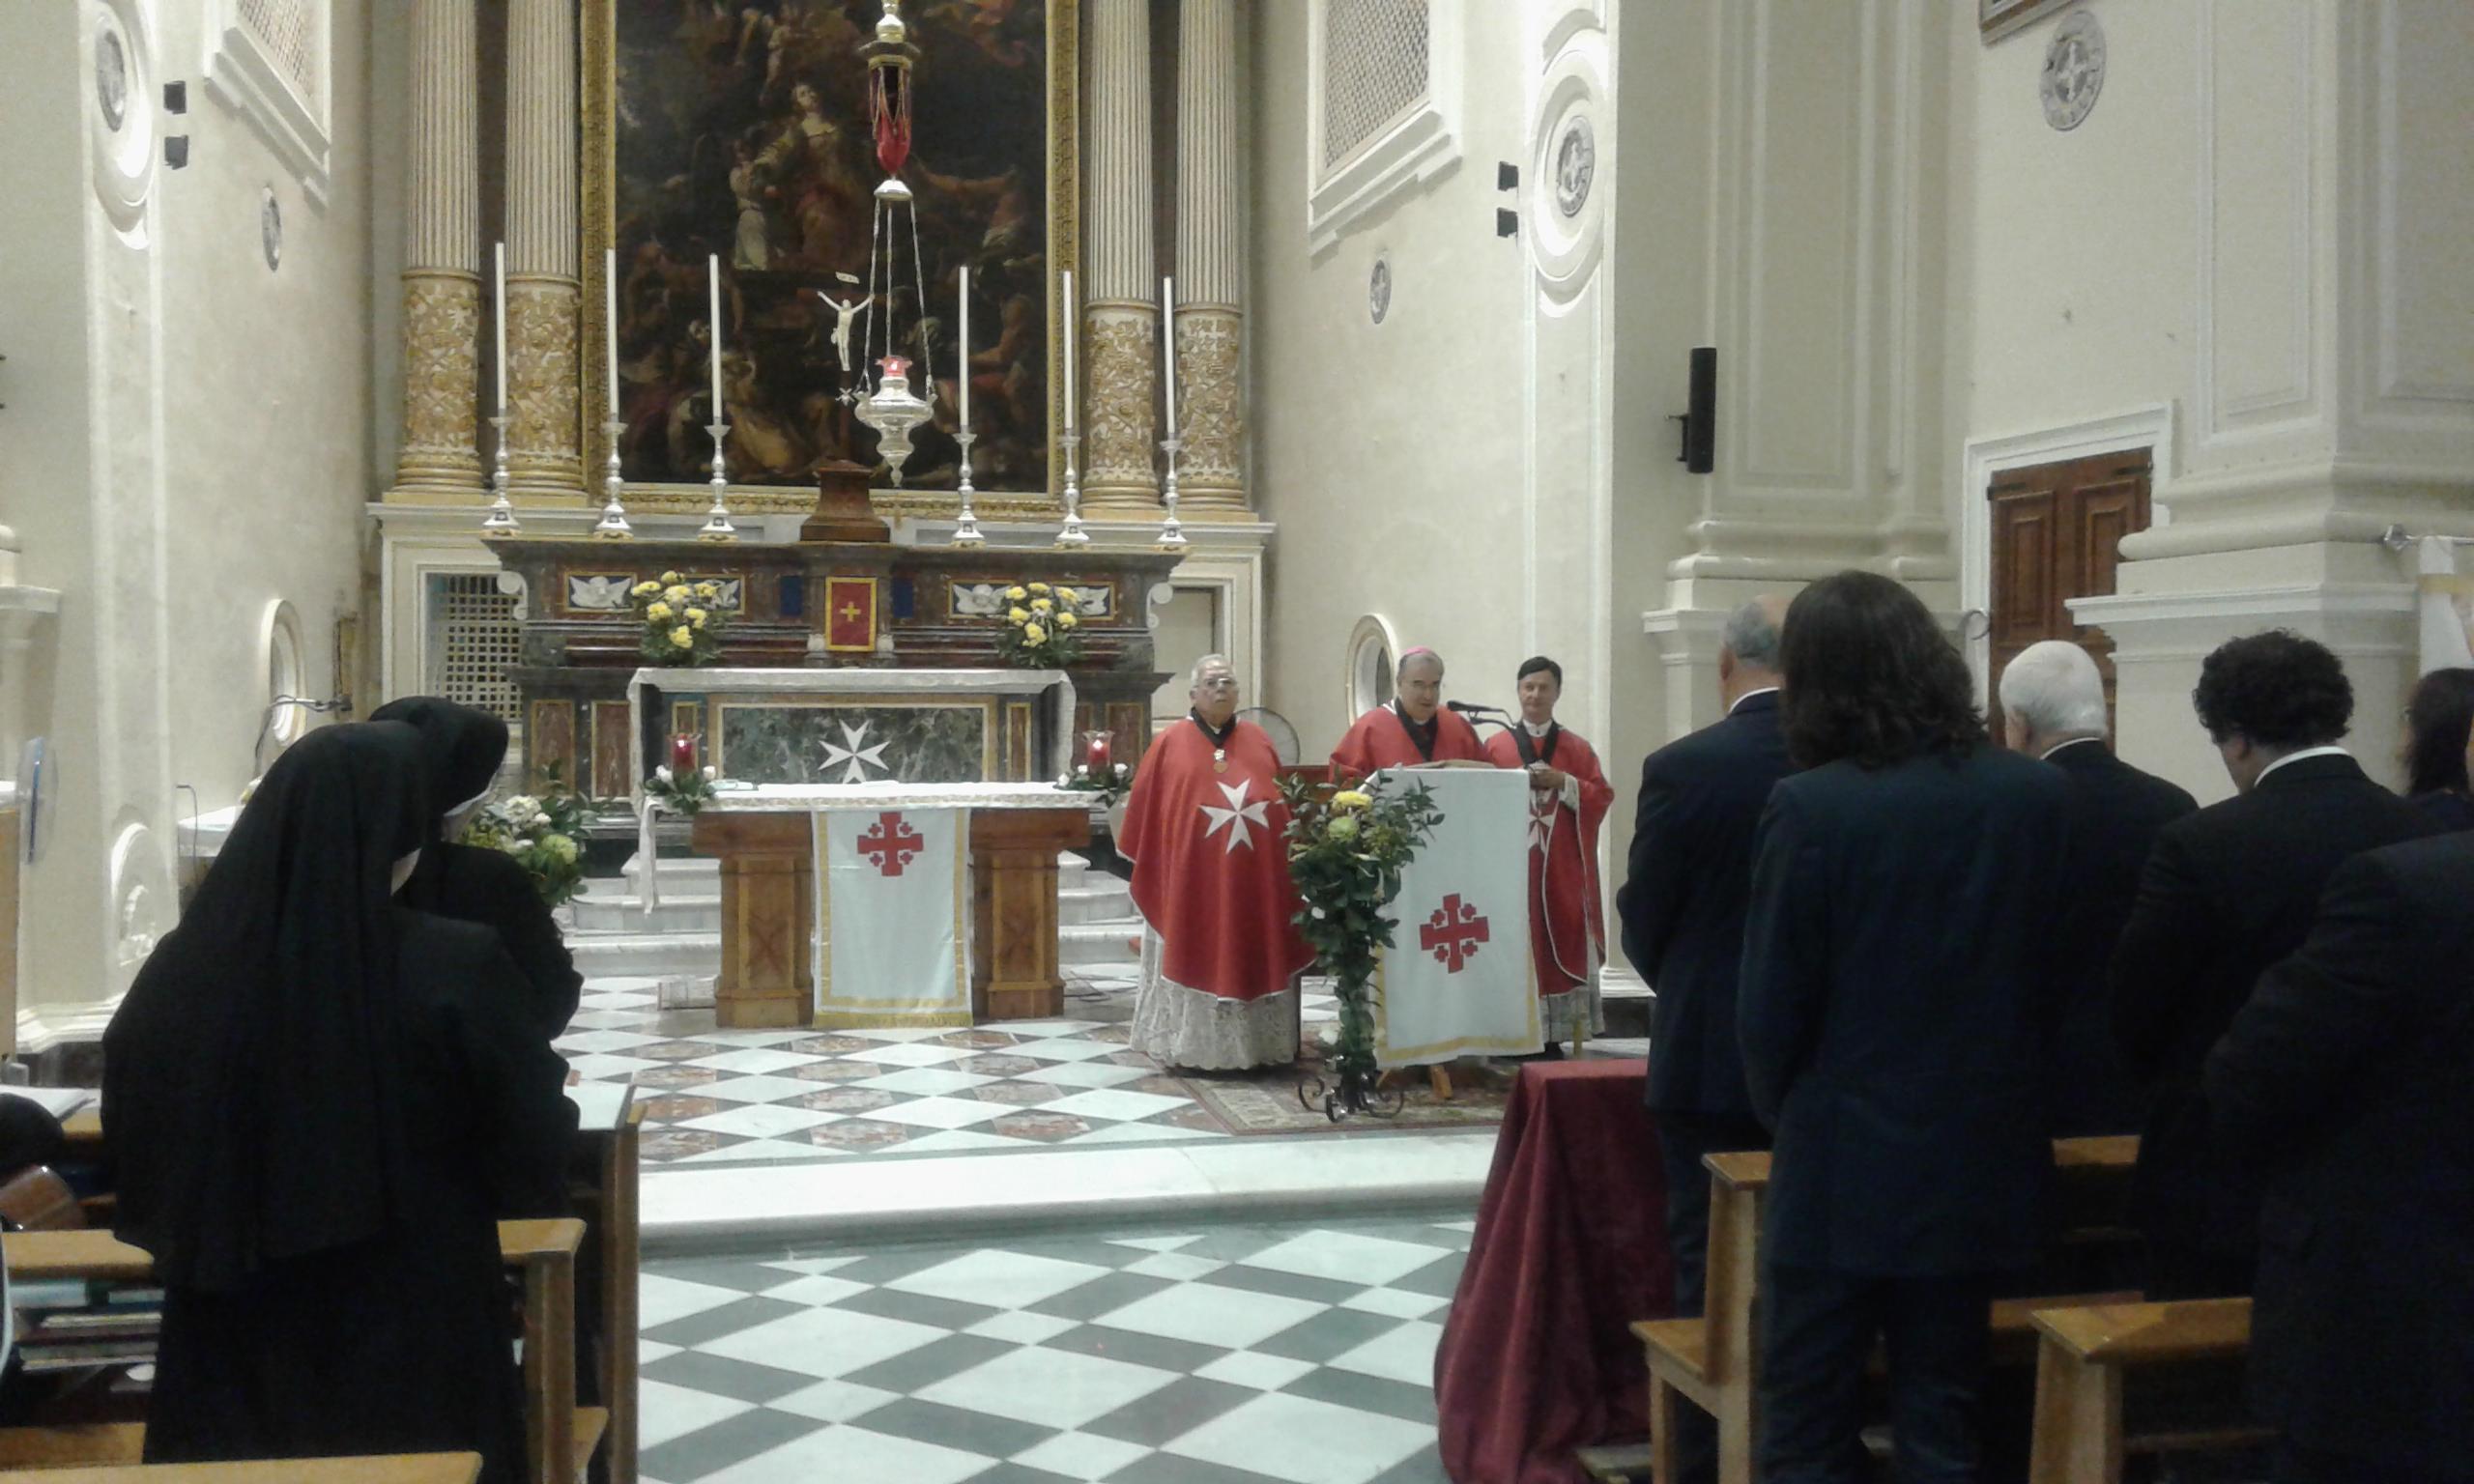 His Grace, Archbishop Emeritus of Malta, Mgr. Paul Cremona O.P celebrating the anniversary mass